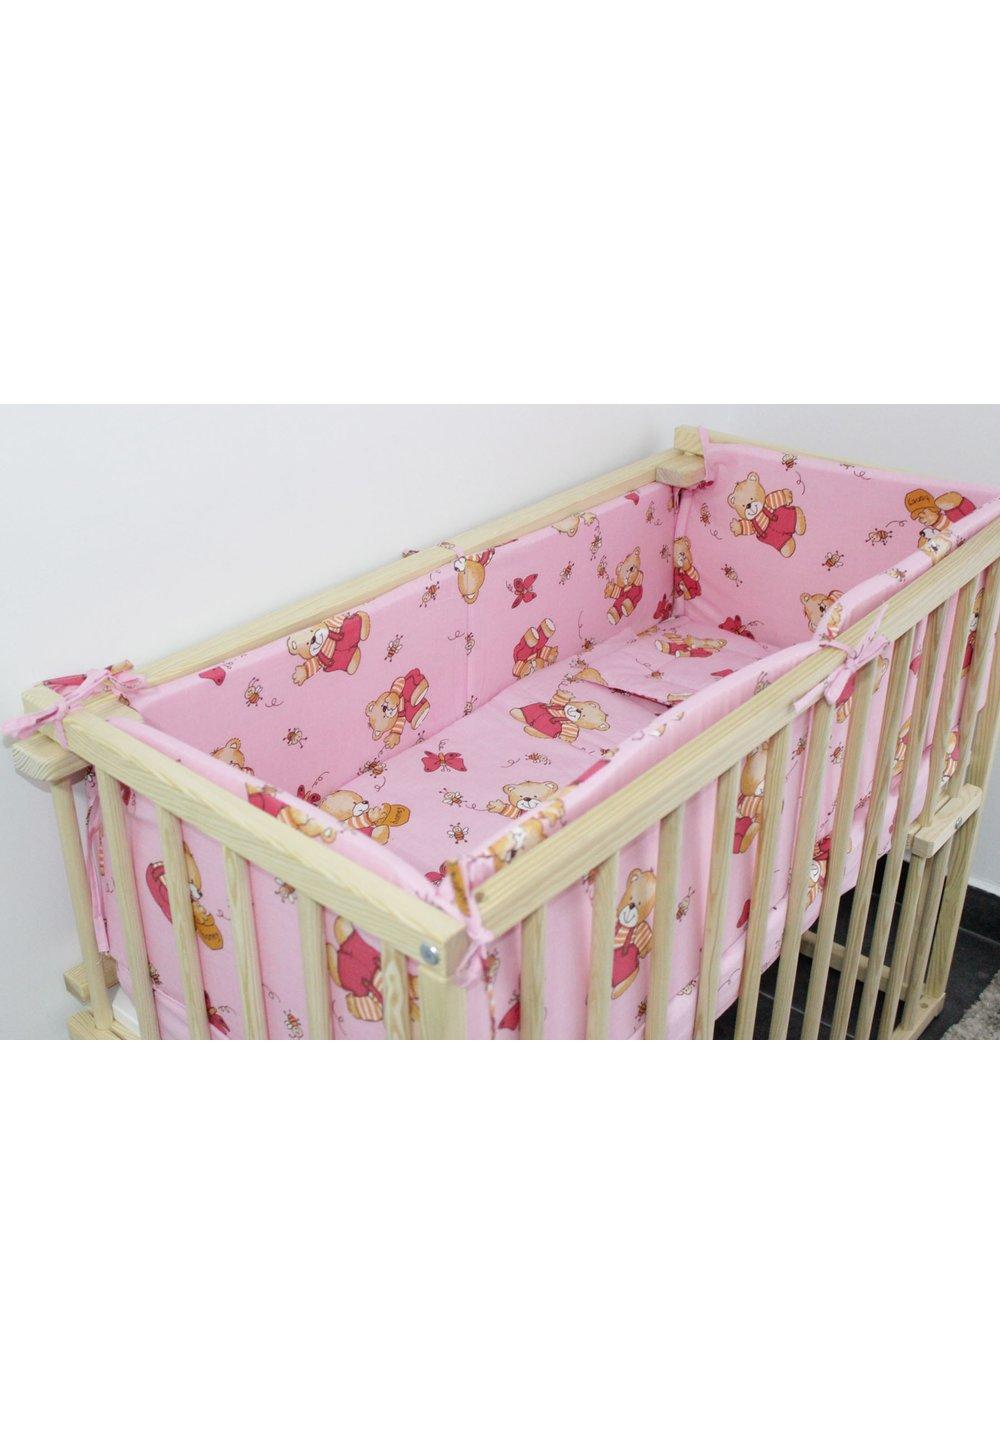 Lenjerie 5 piese, piccolo, ursulet cu albinute, roz, 95x45cm imagine